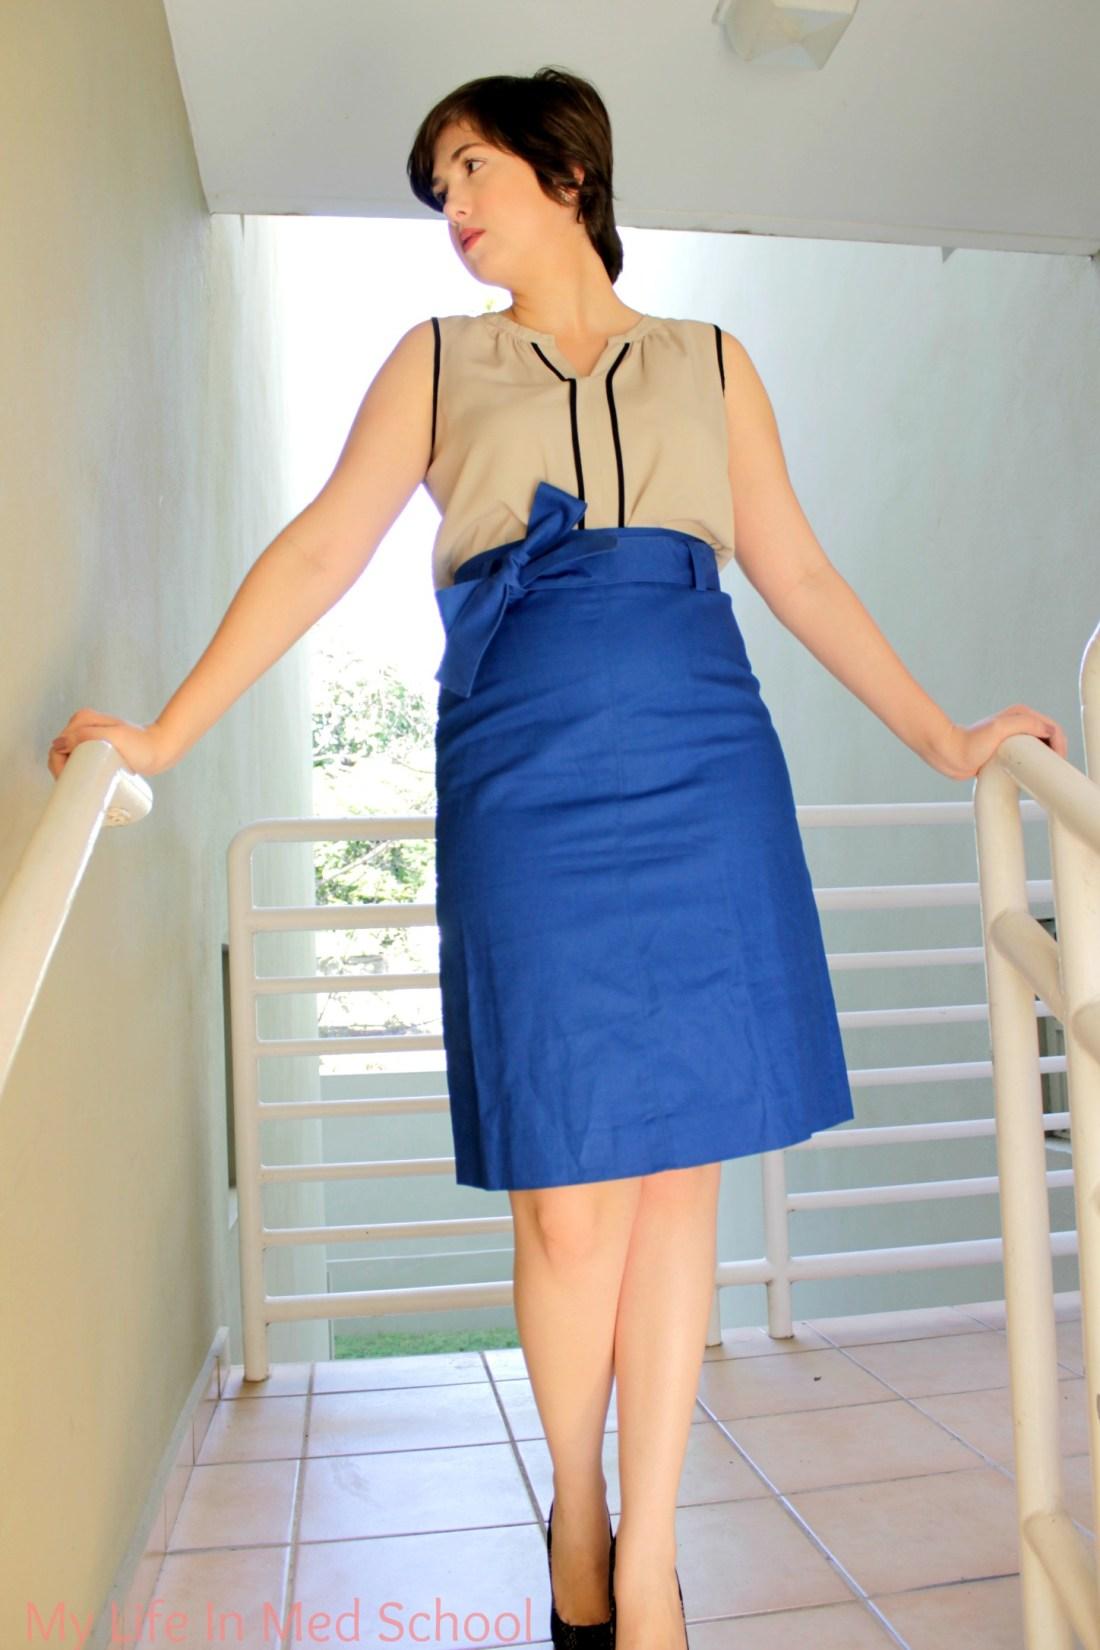 j-crew-tie-waist-skirt